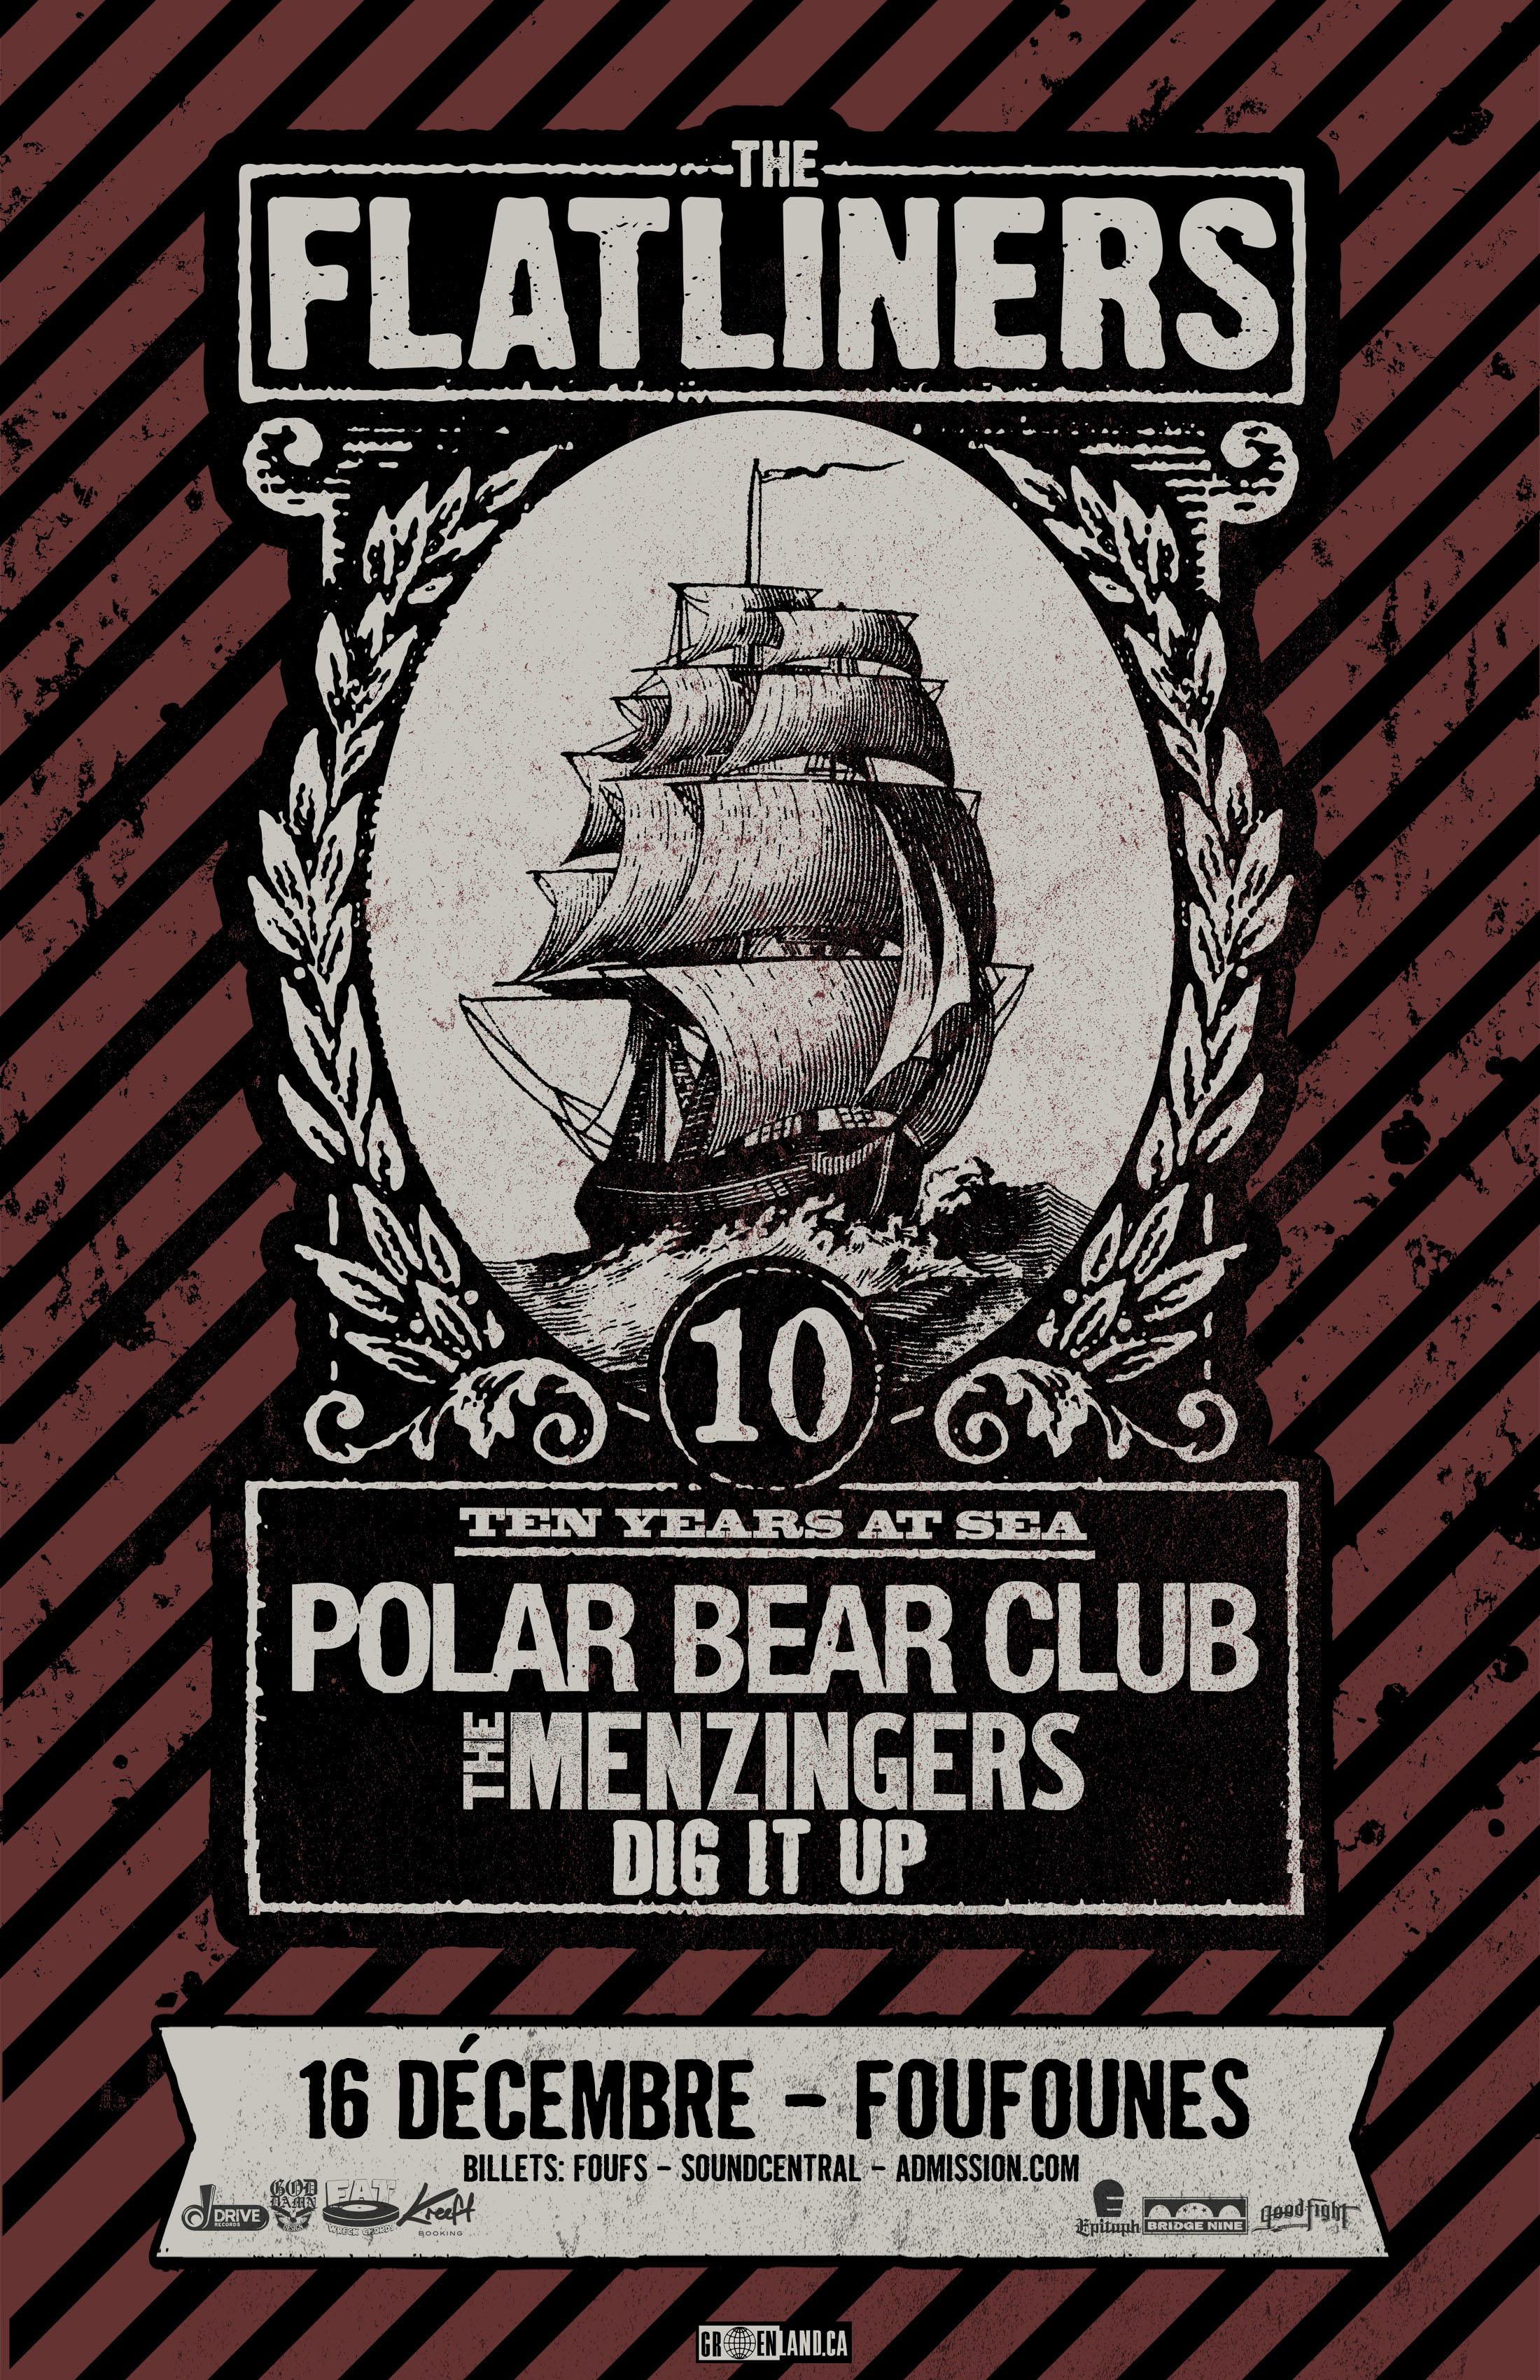 Flatliners(Dec12)_poster